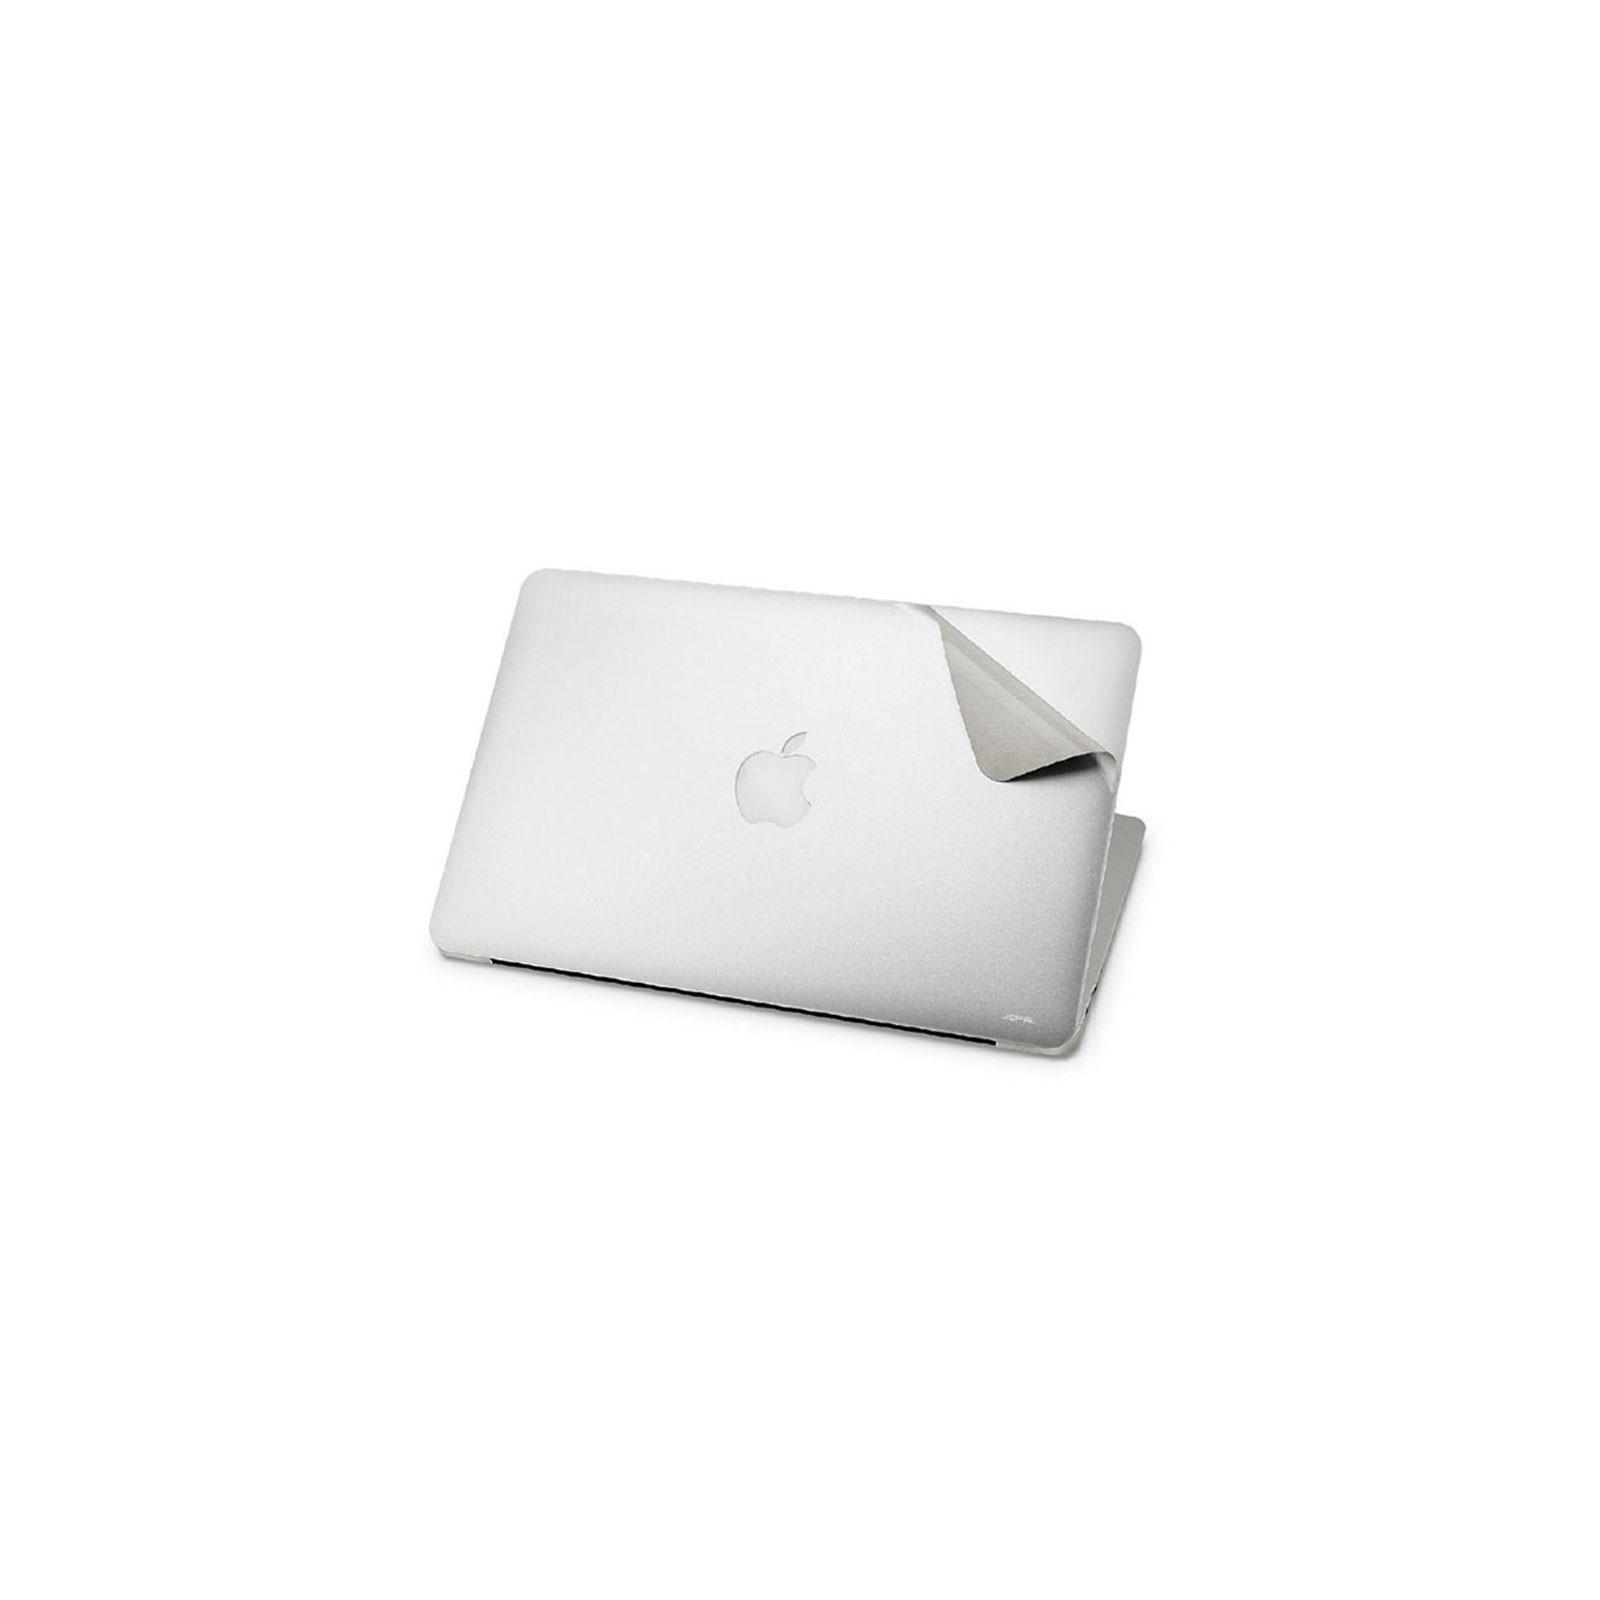 Пленка защитная JCPAL 3 in 1 set для MacBook Pro 13 (JCP2045) изображение 3